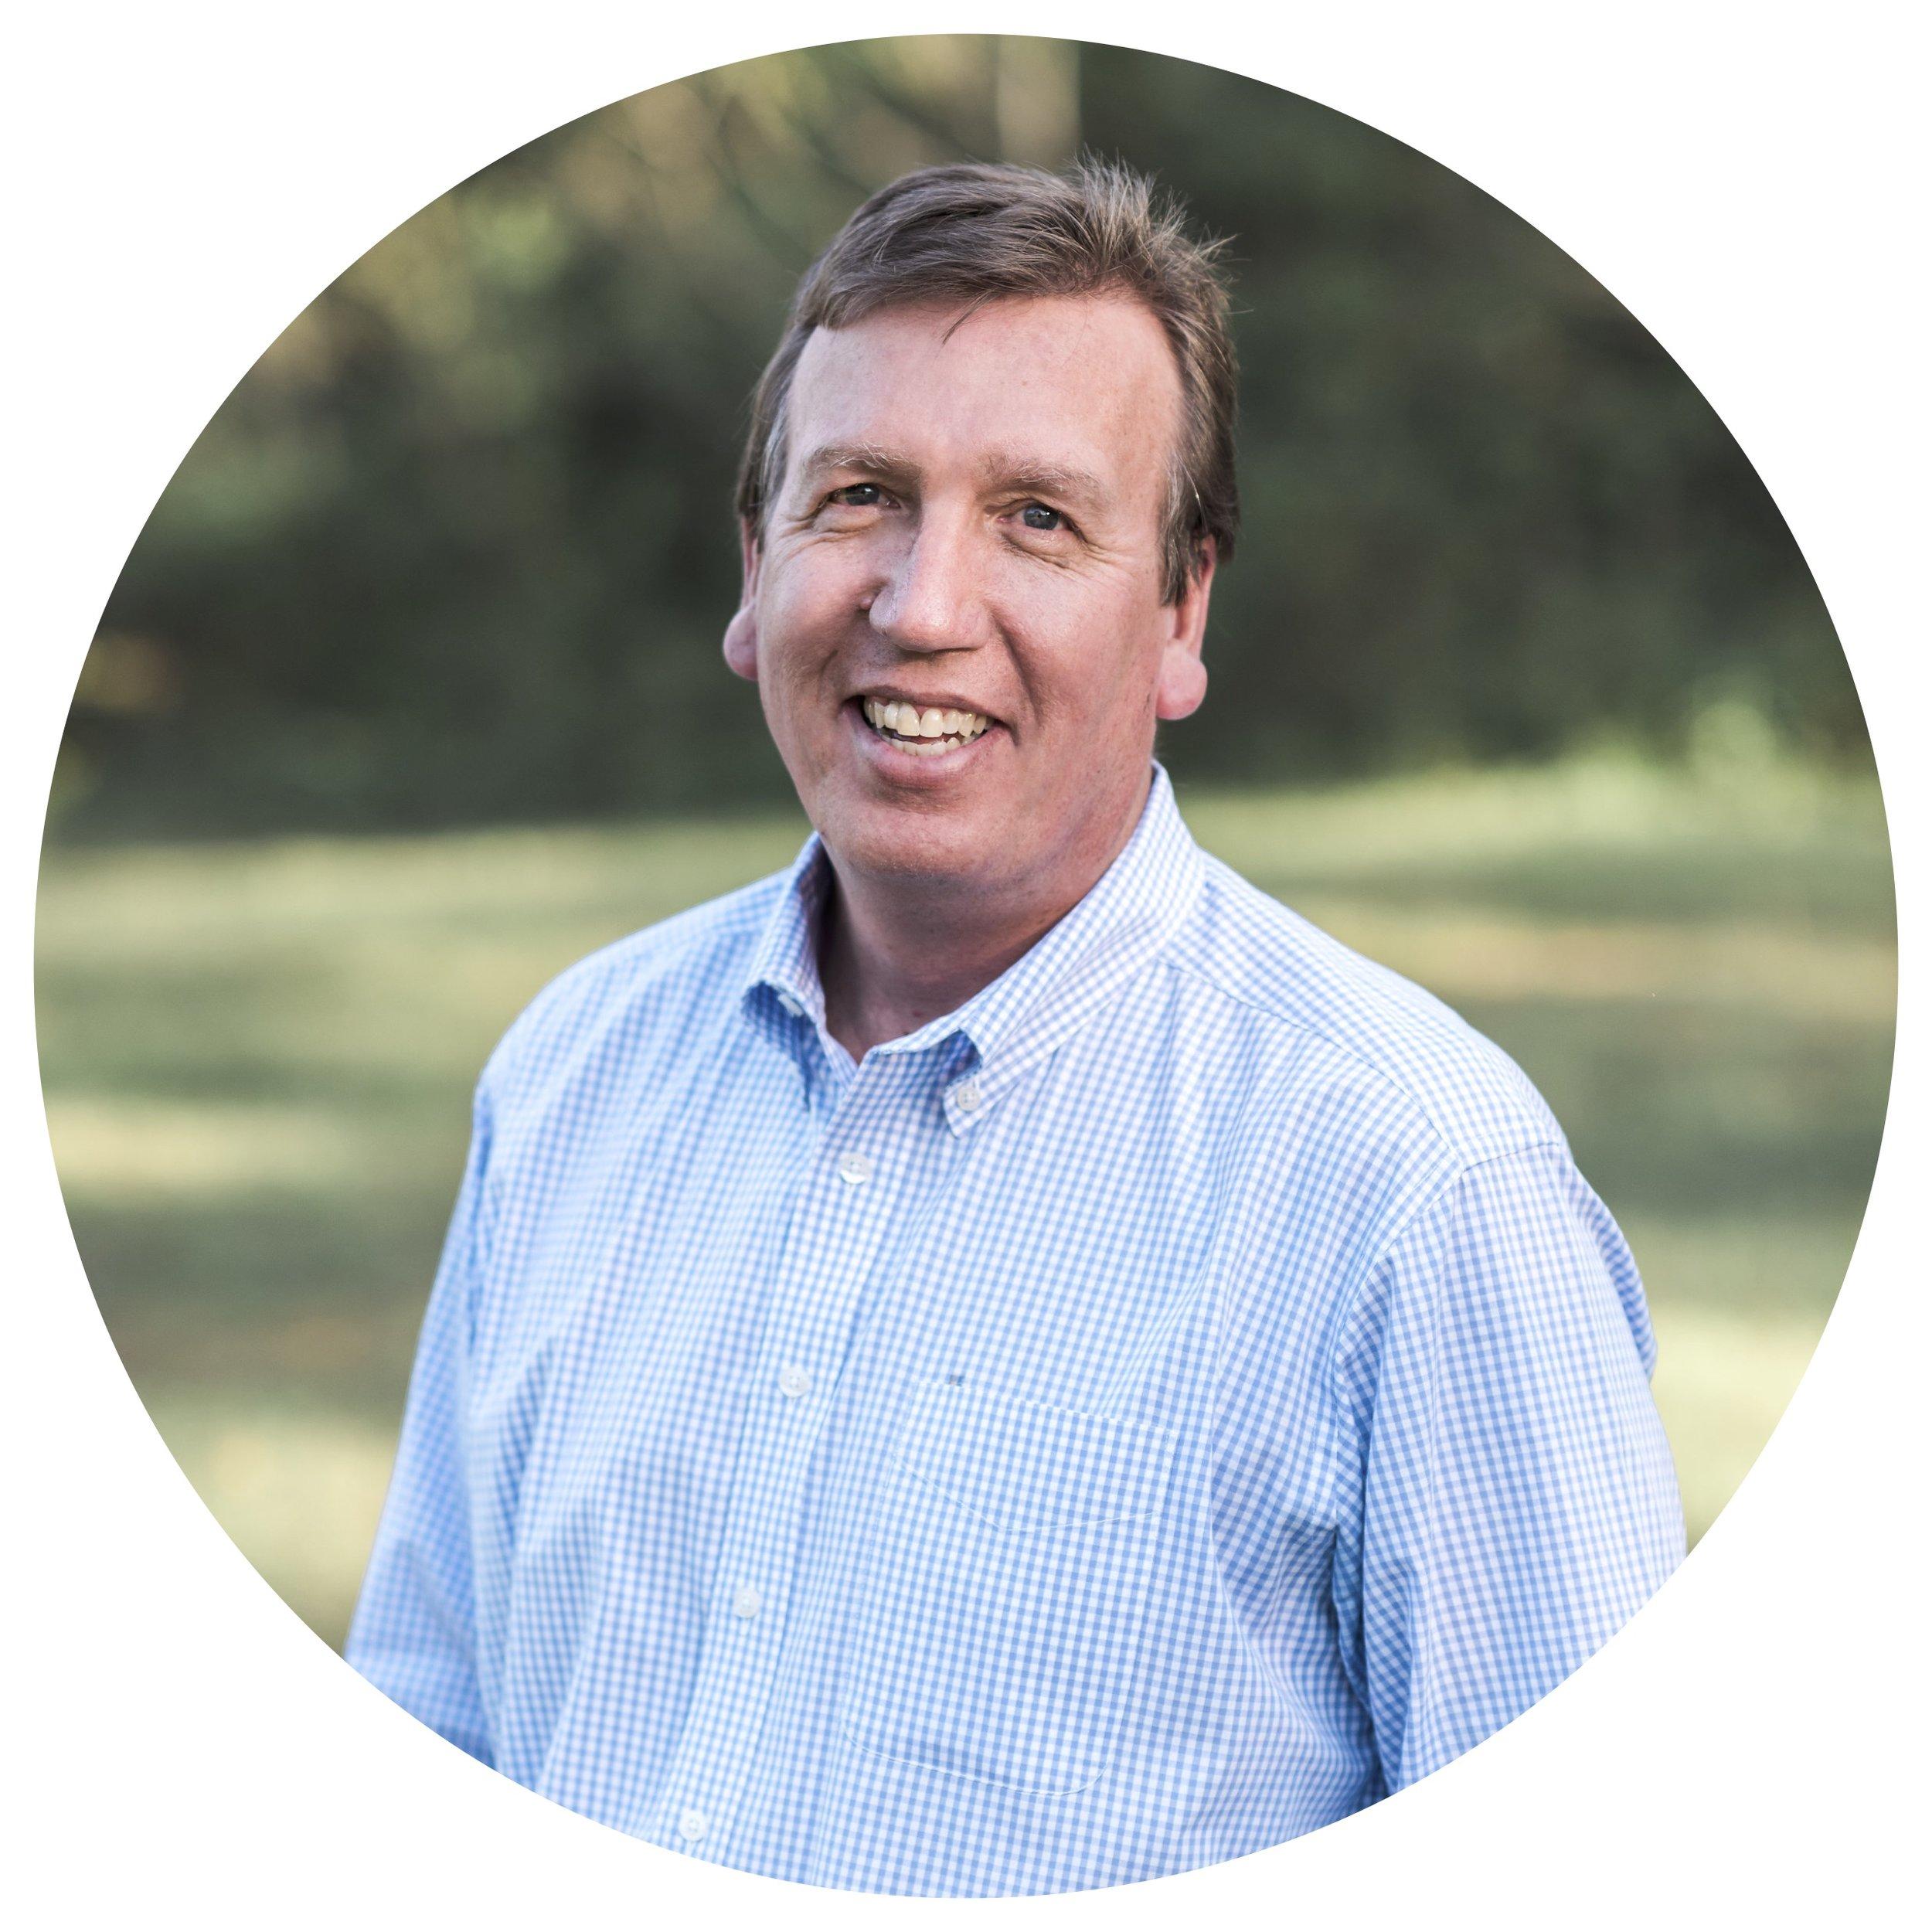 JEFF FLAVIN  Co-Founder, Chief Executive Officer  Jeff@helpfeedserve.org